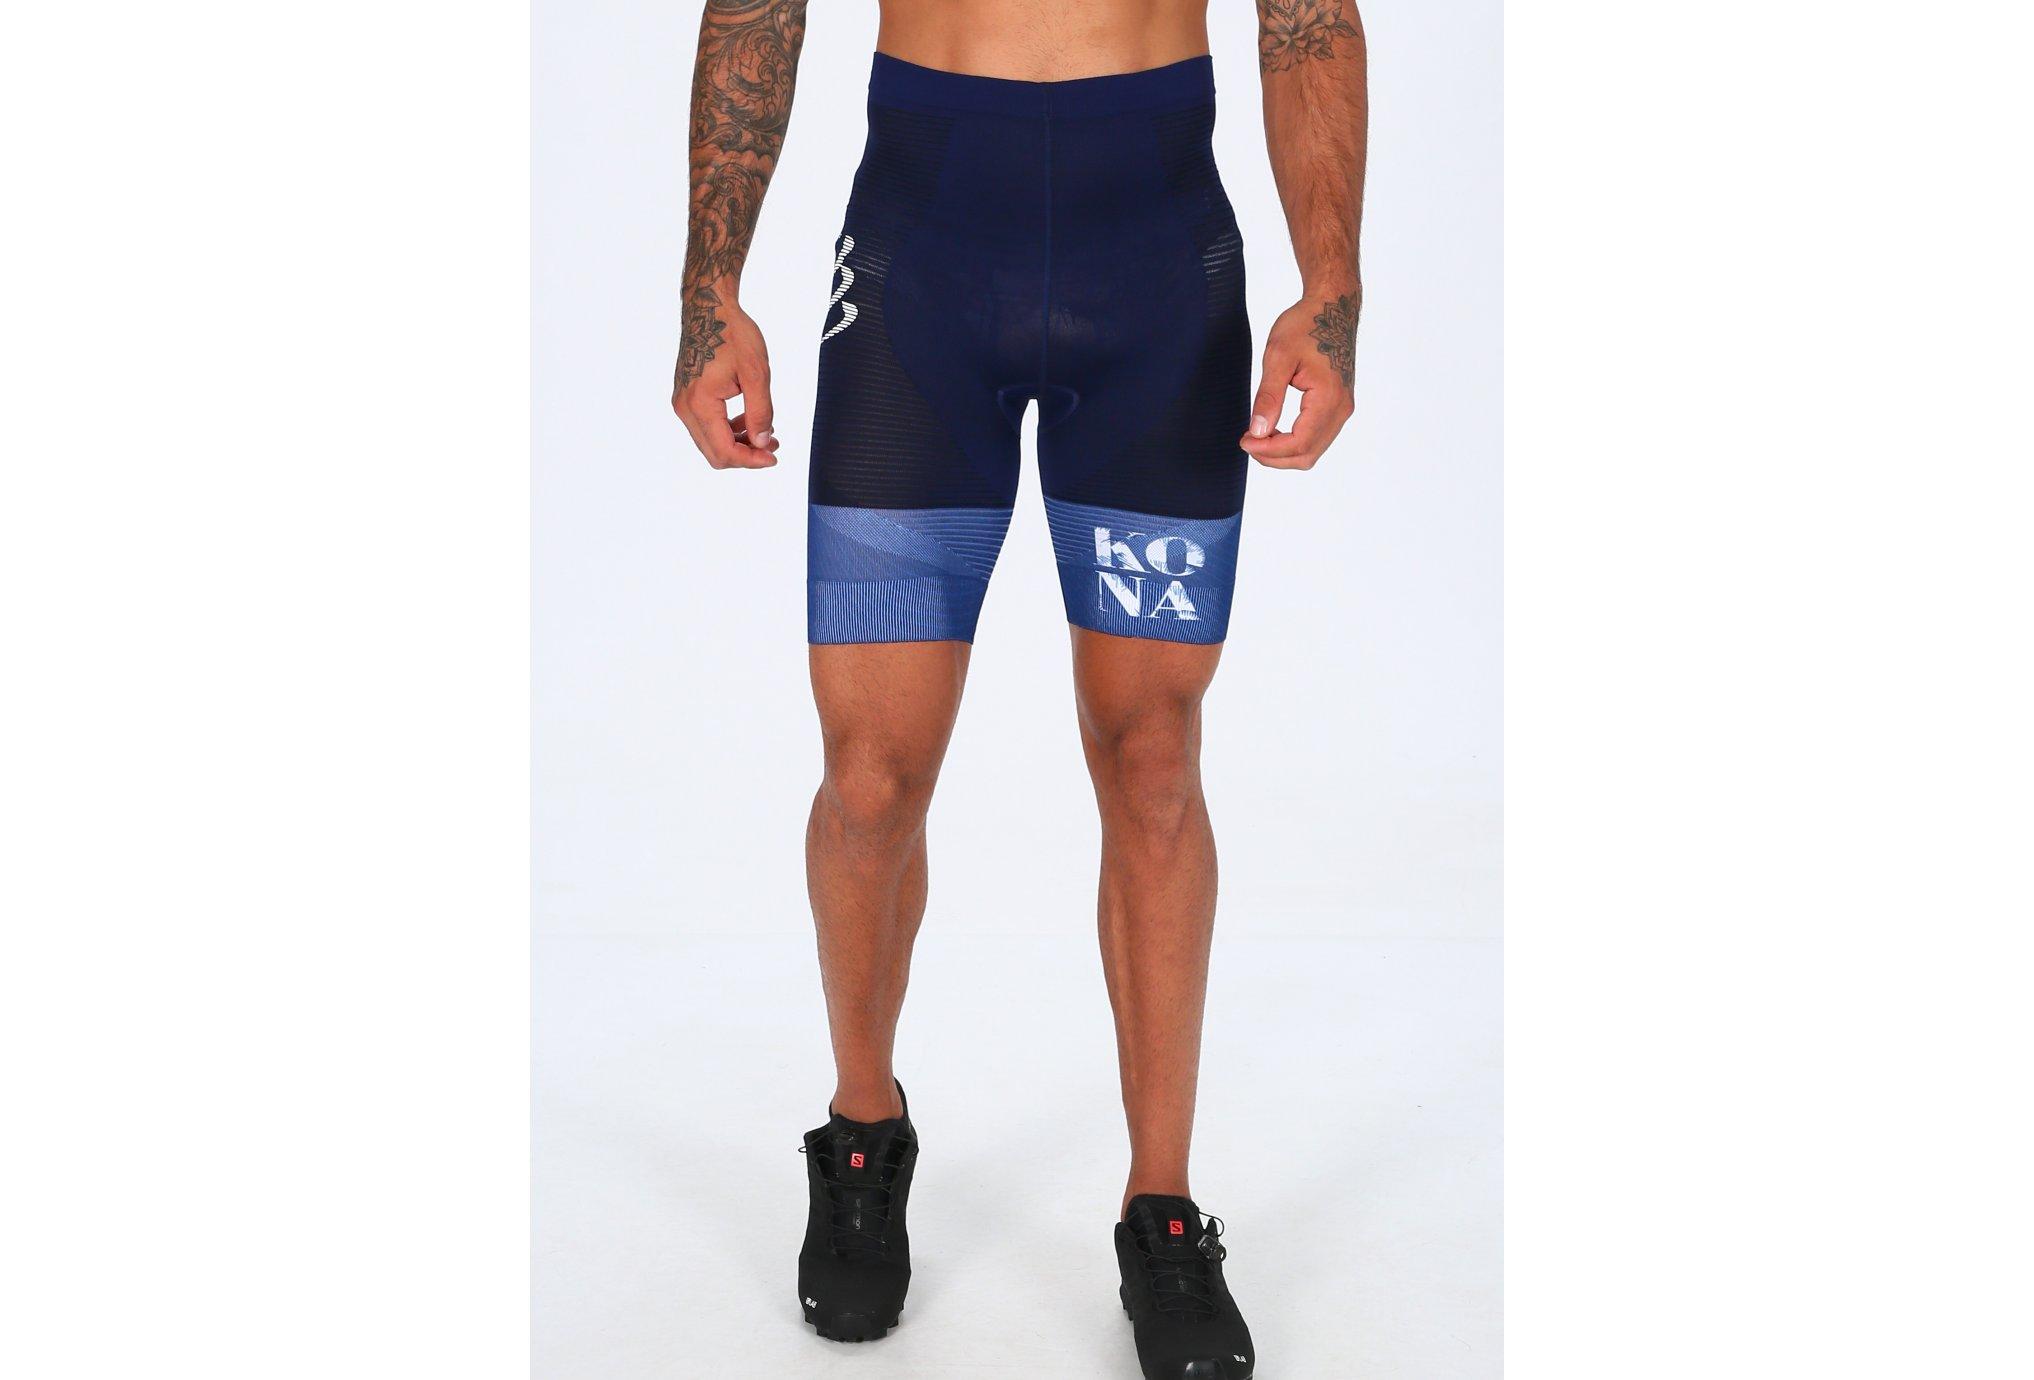 Compressport Under Control Kona 2018 M vêtement running homme